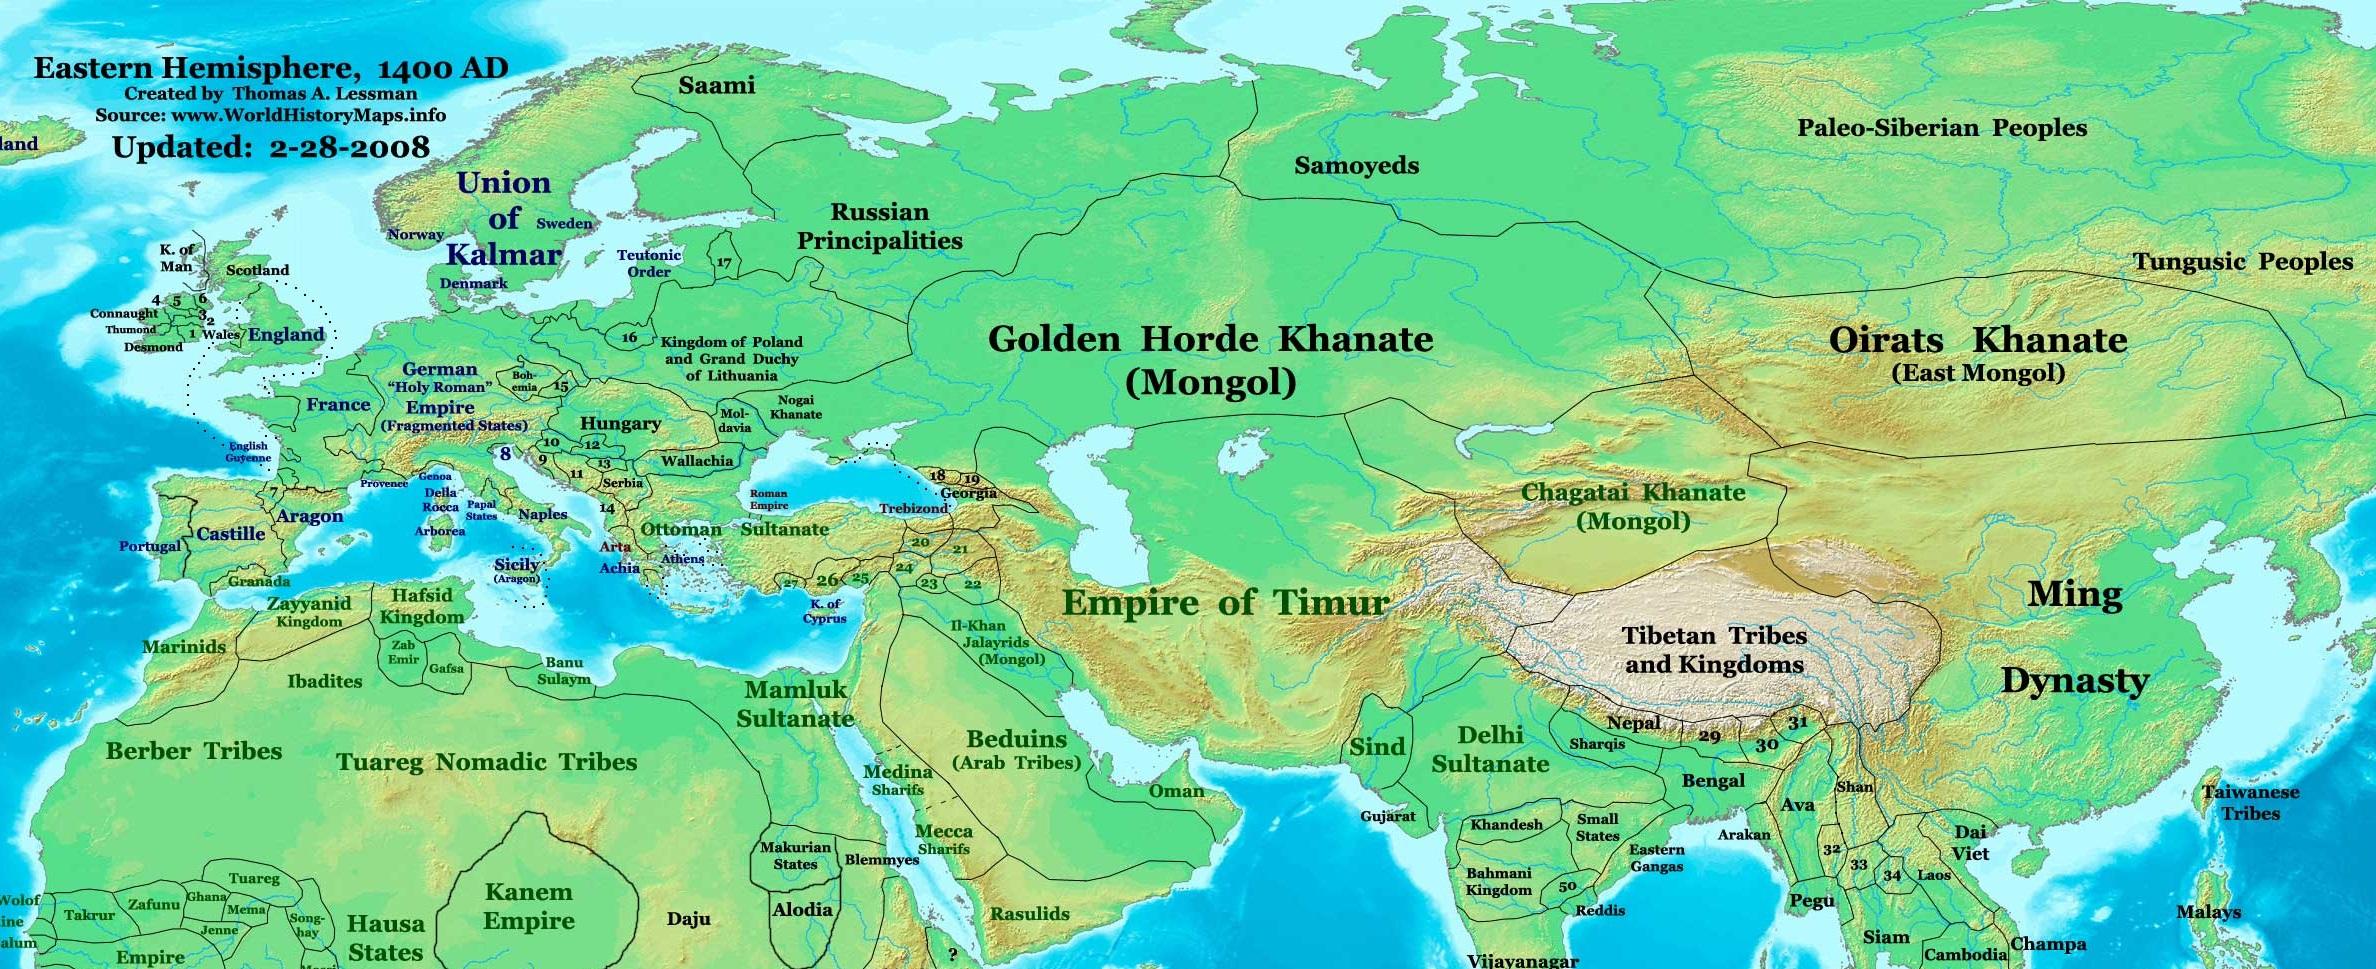 1400 AD